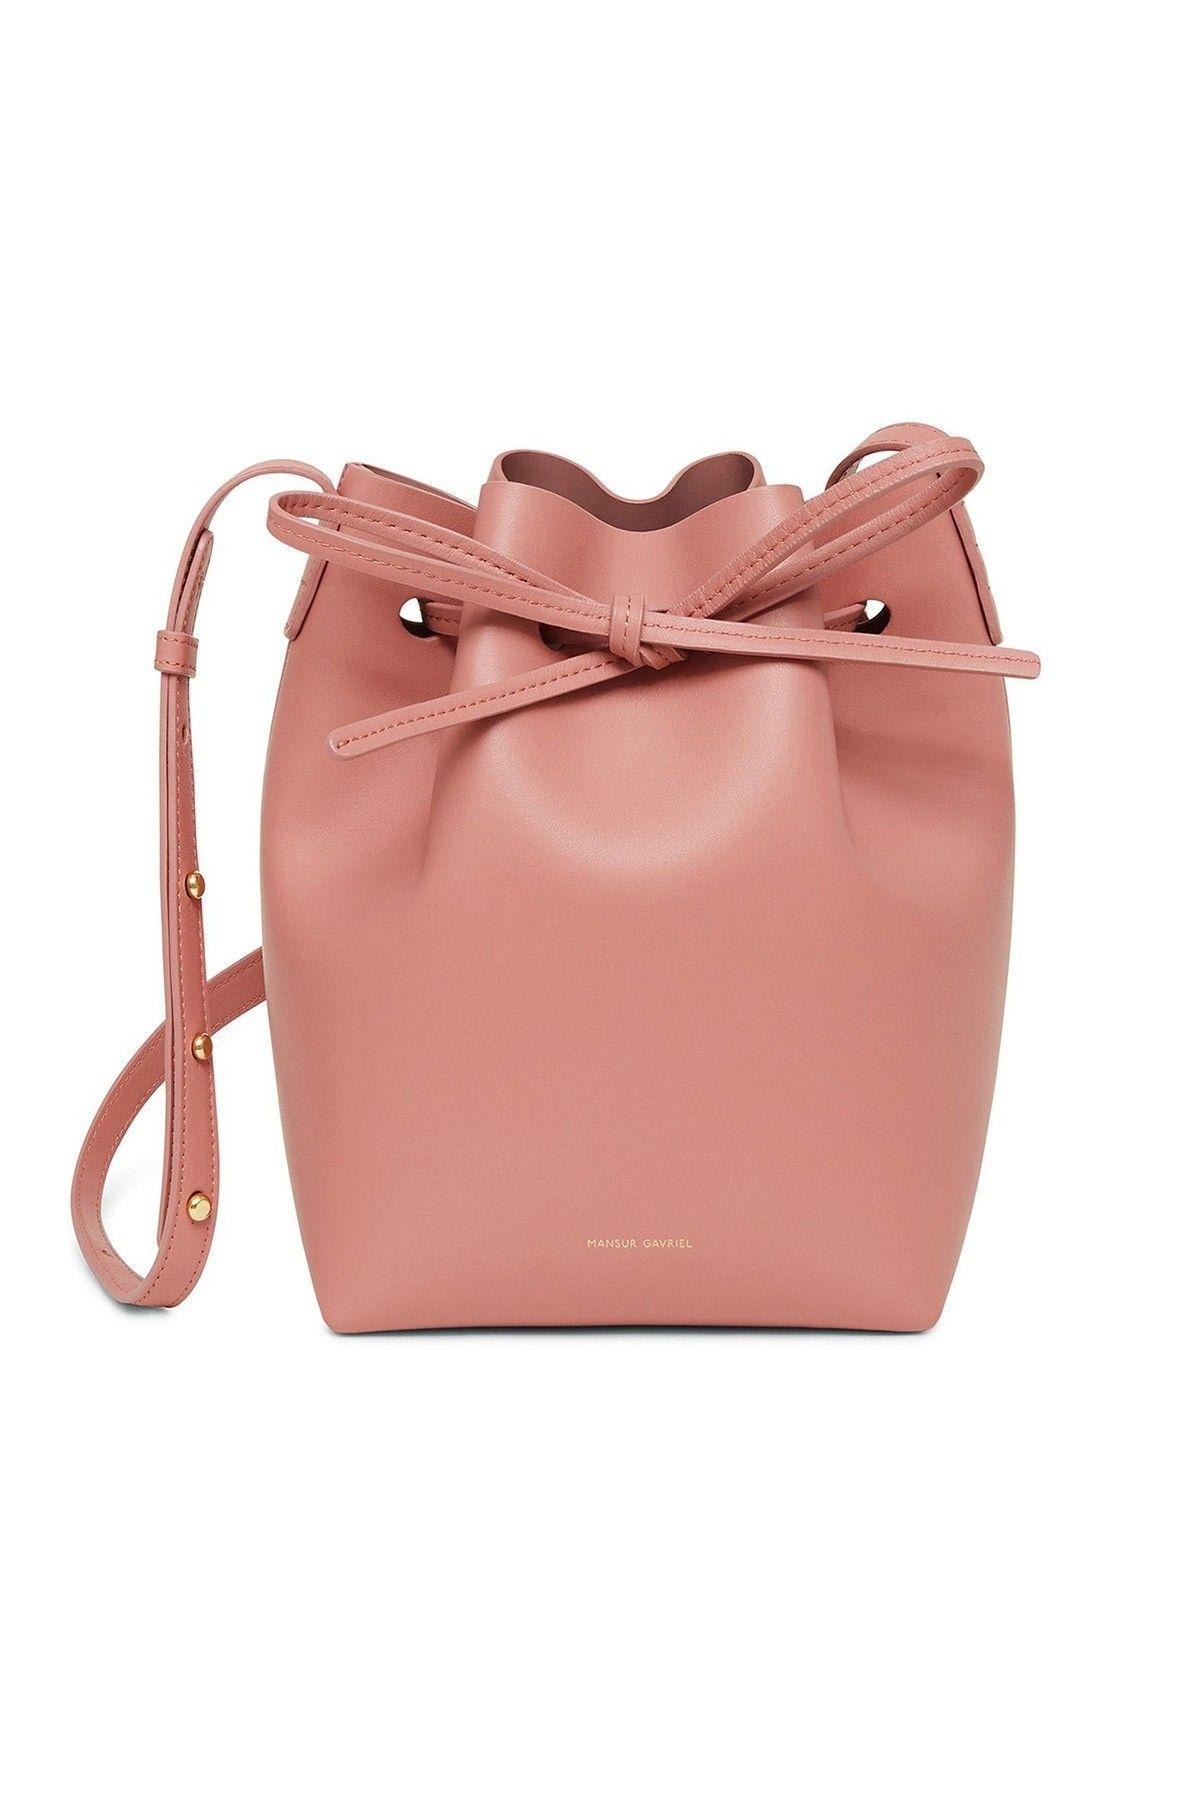 Calf Mini Bucket Bag In Blush In 2019 Hampden Bags Bags Bucket